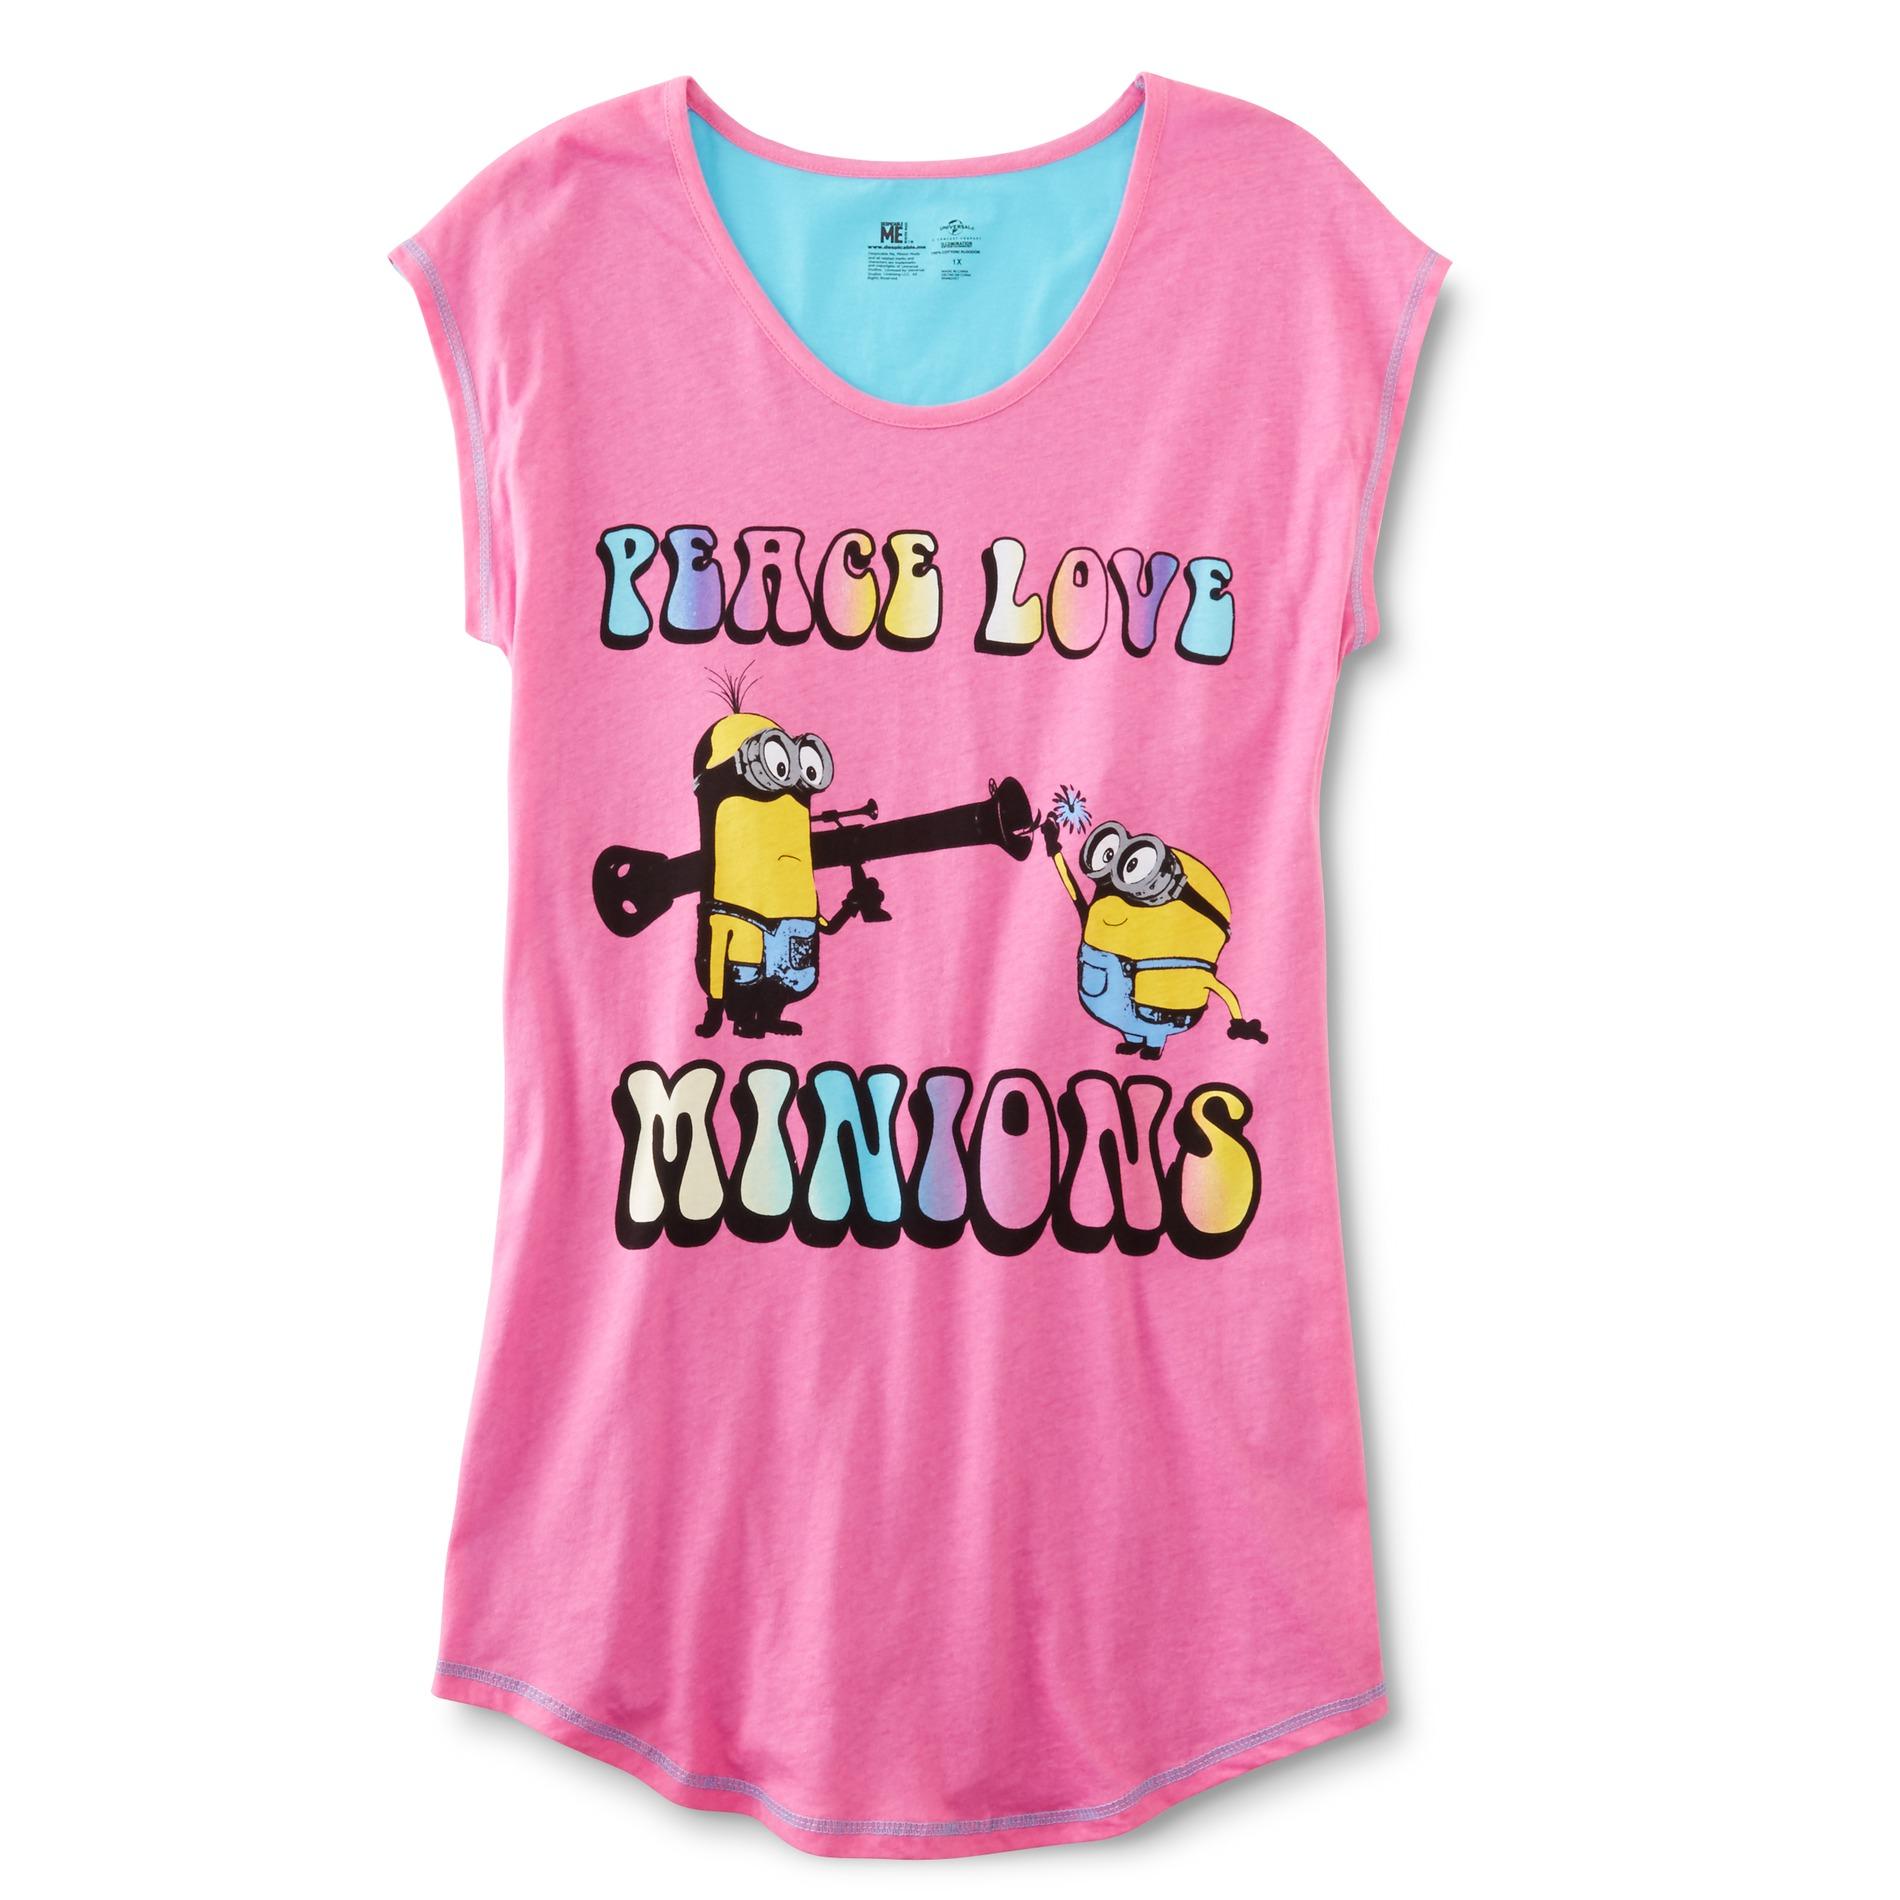 Despicable Me Women's Plus Sleep Shirt - Minions PartNumber: 027VA89633212P MfgPartNumber: DM166WDSKM